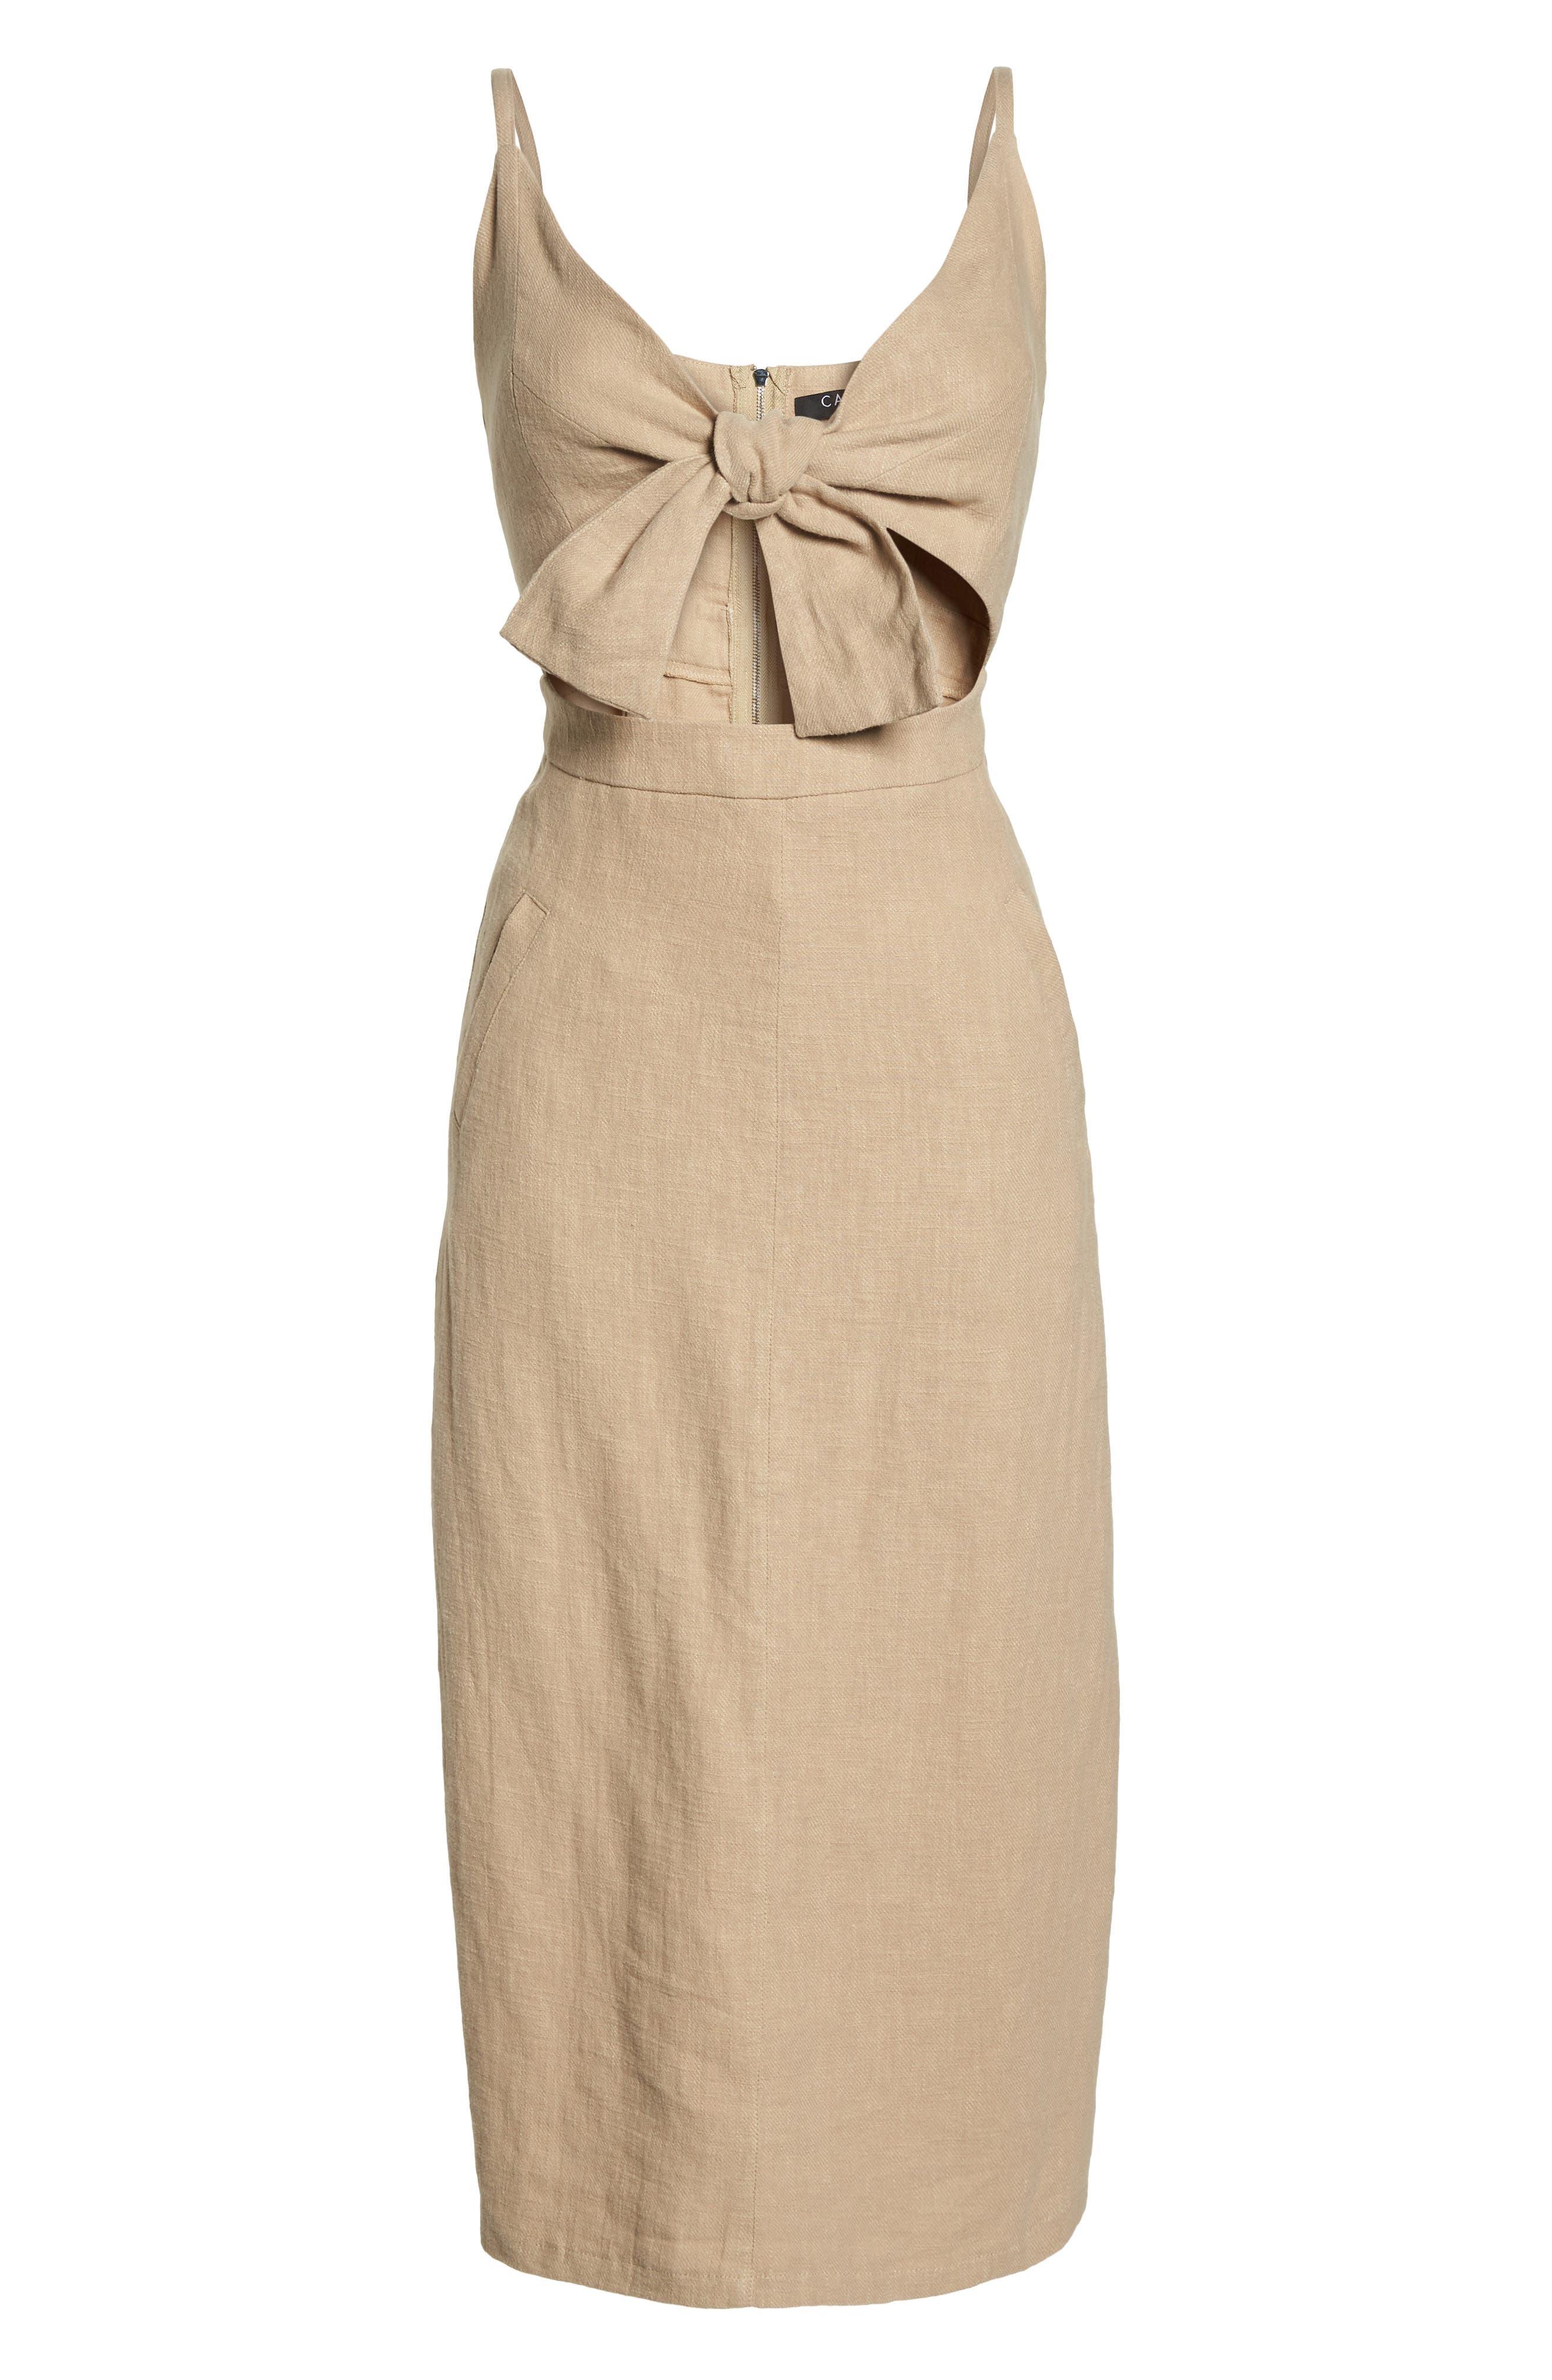 CAARA,                             Tie Front Linen Blend Sundress,                             Alternate thumbnail 7, color,                             250